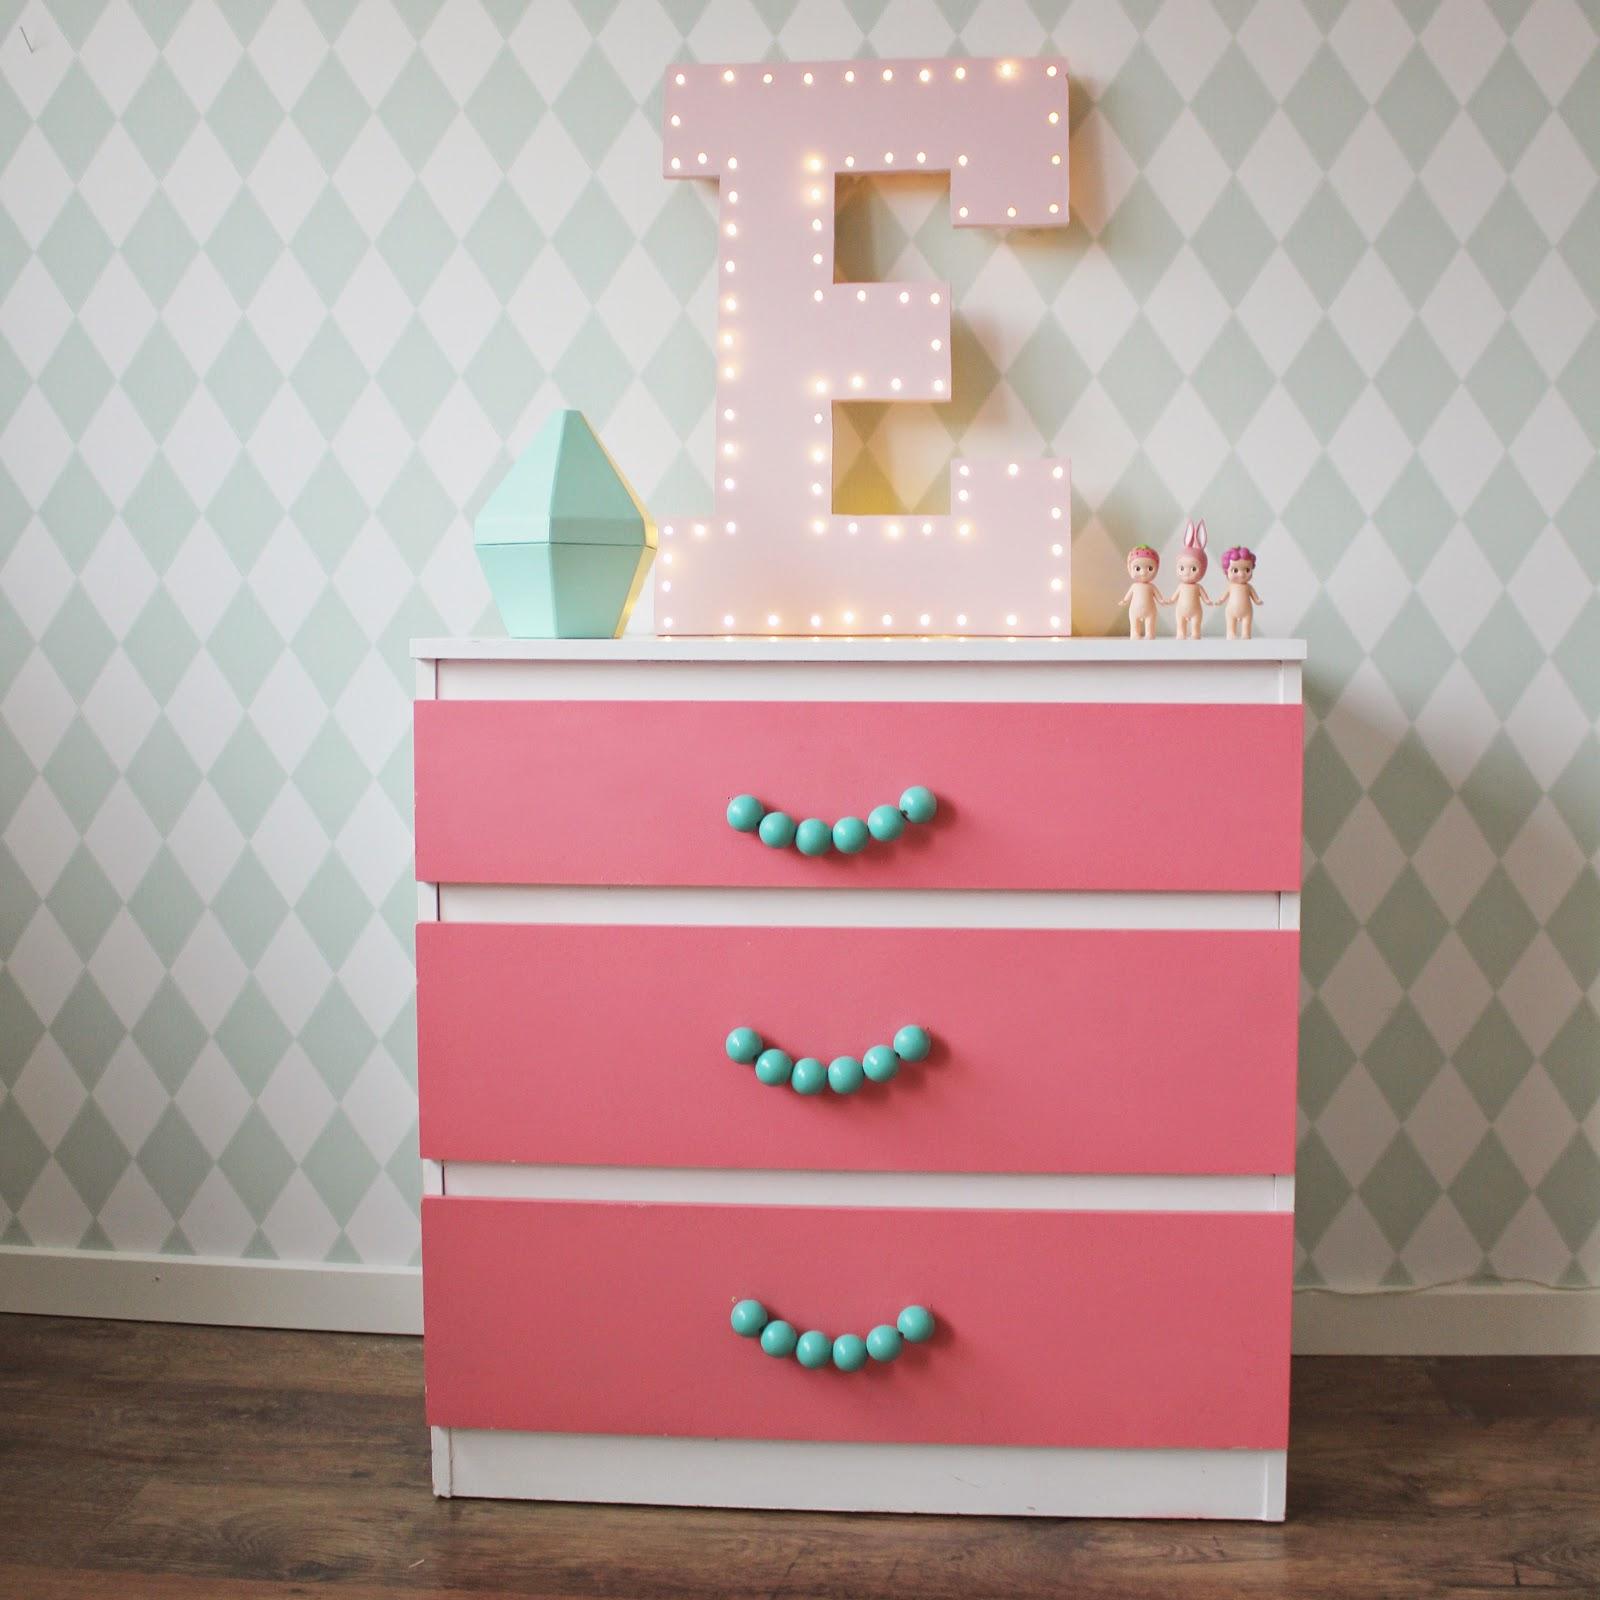 Miss cutiepie inspiration freebies inspiration Dressers for kids